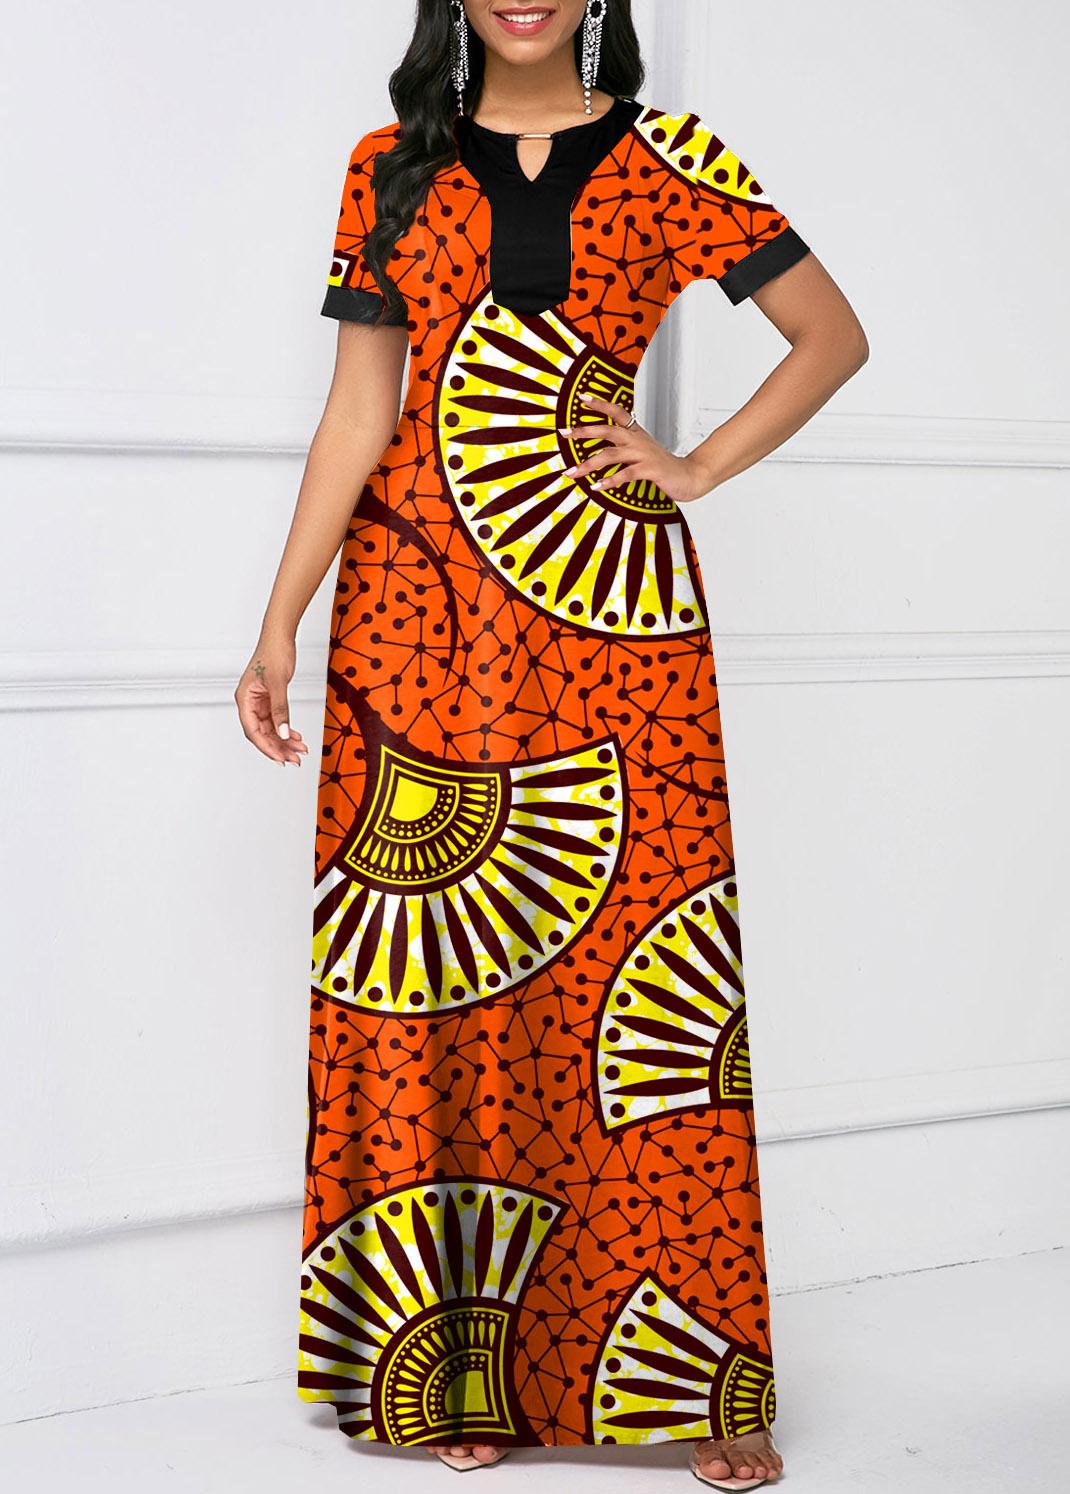 Tribal Print Keyhole Neckline Short Sleeve Dress